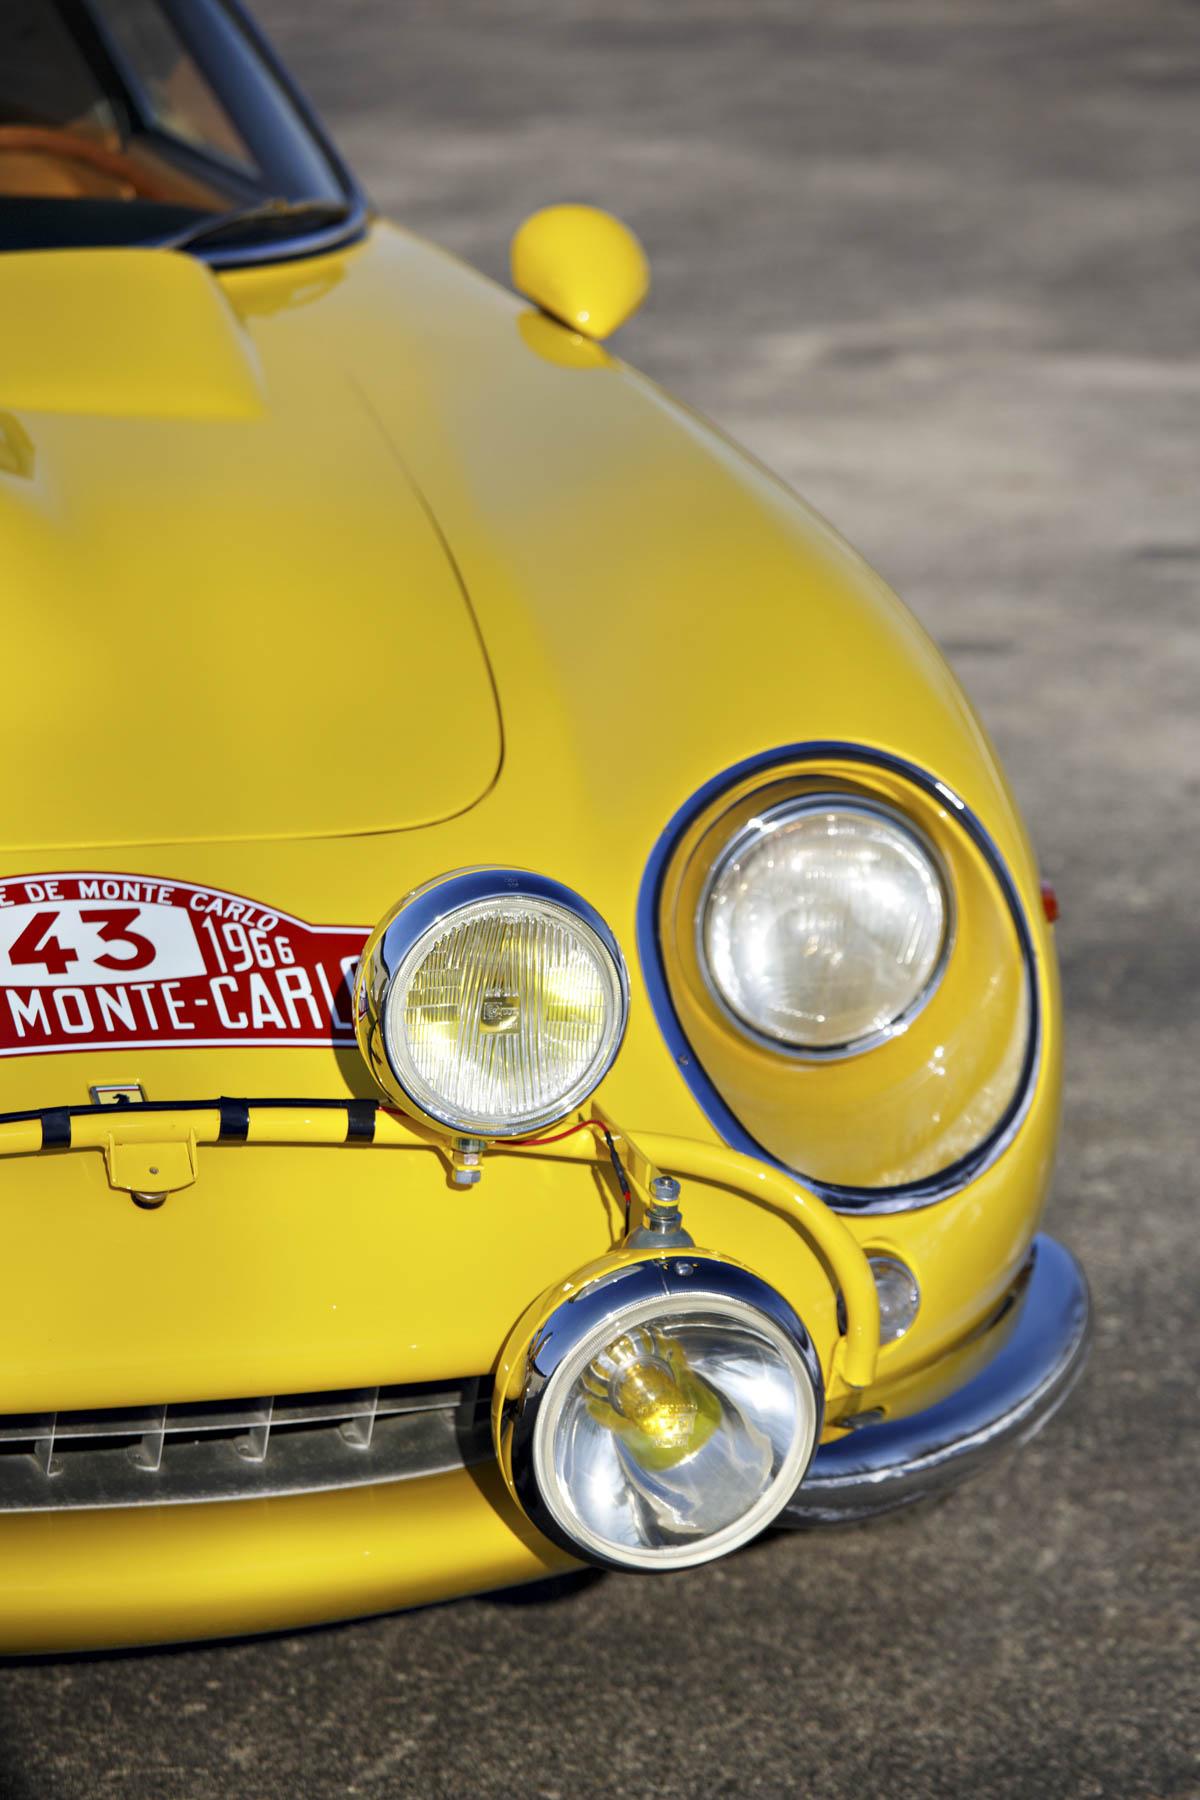 1964 Ferrari 275 GTB Prototype headlights